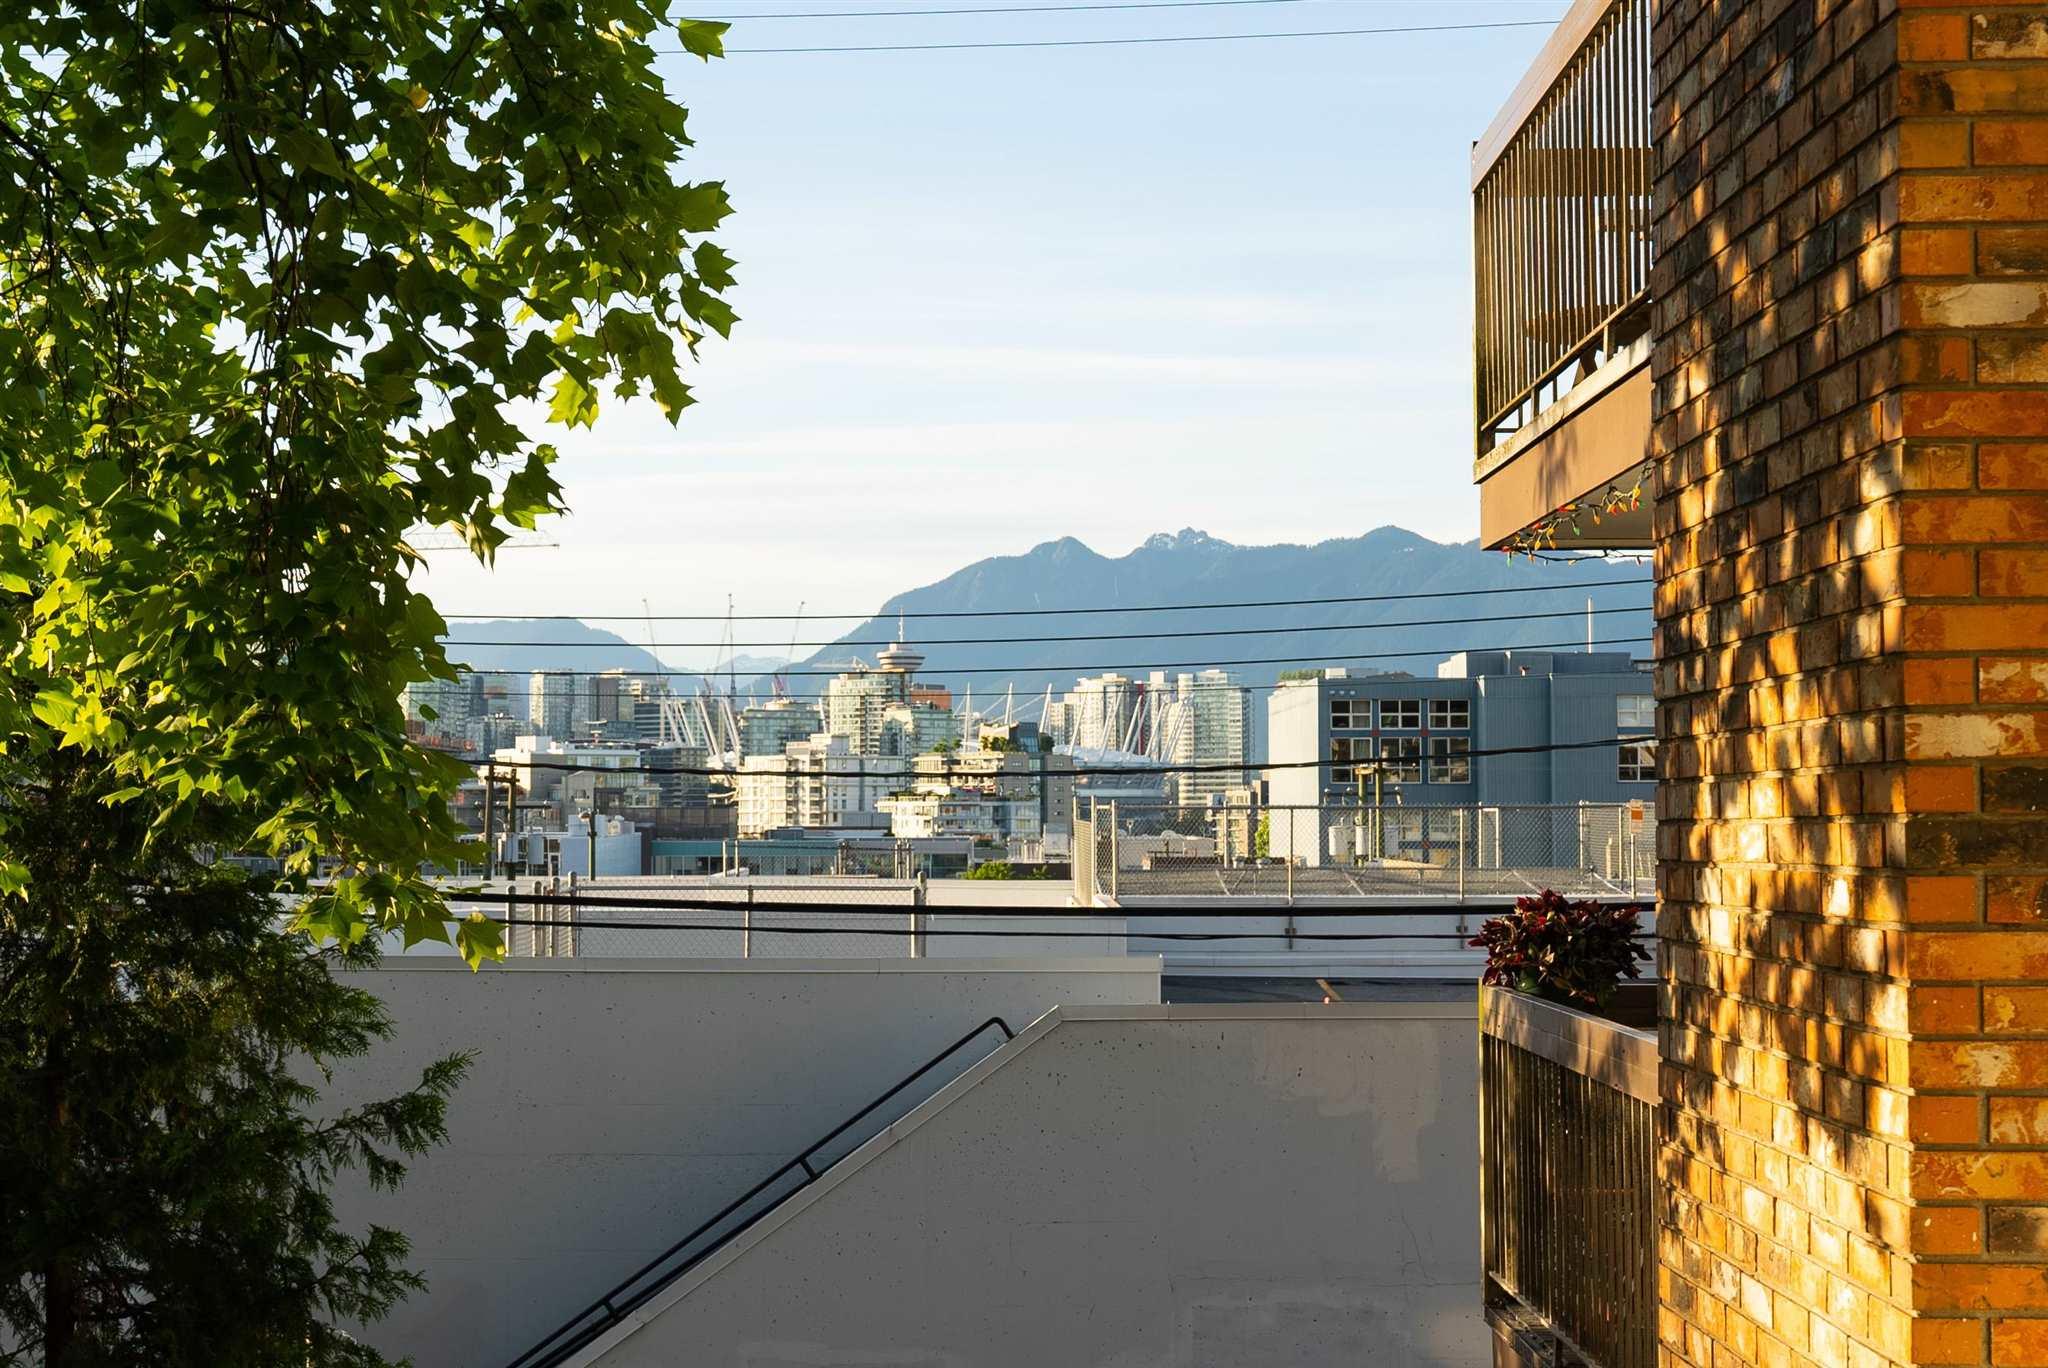 202 345 W 10TH AVENUE - Mount Pleasant VW Apartment/Condo for sale, 1 Bedroom (R2600049)